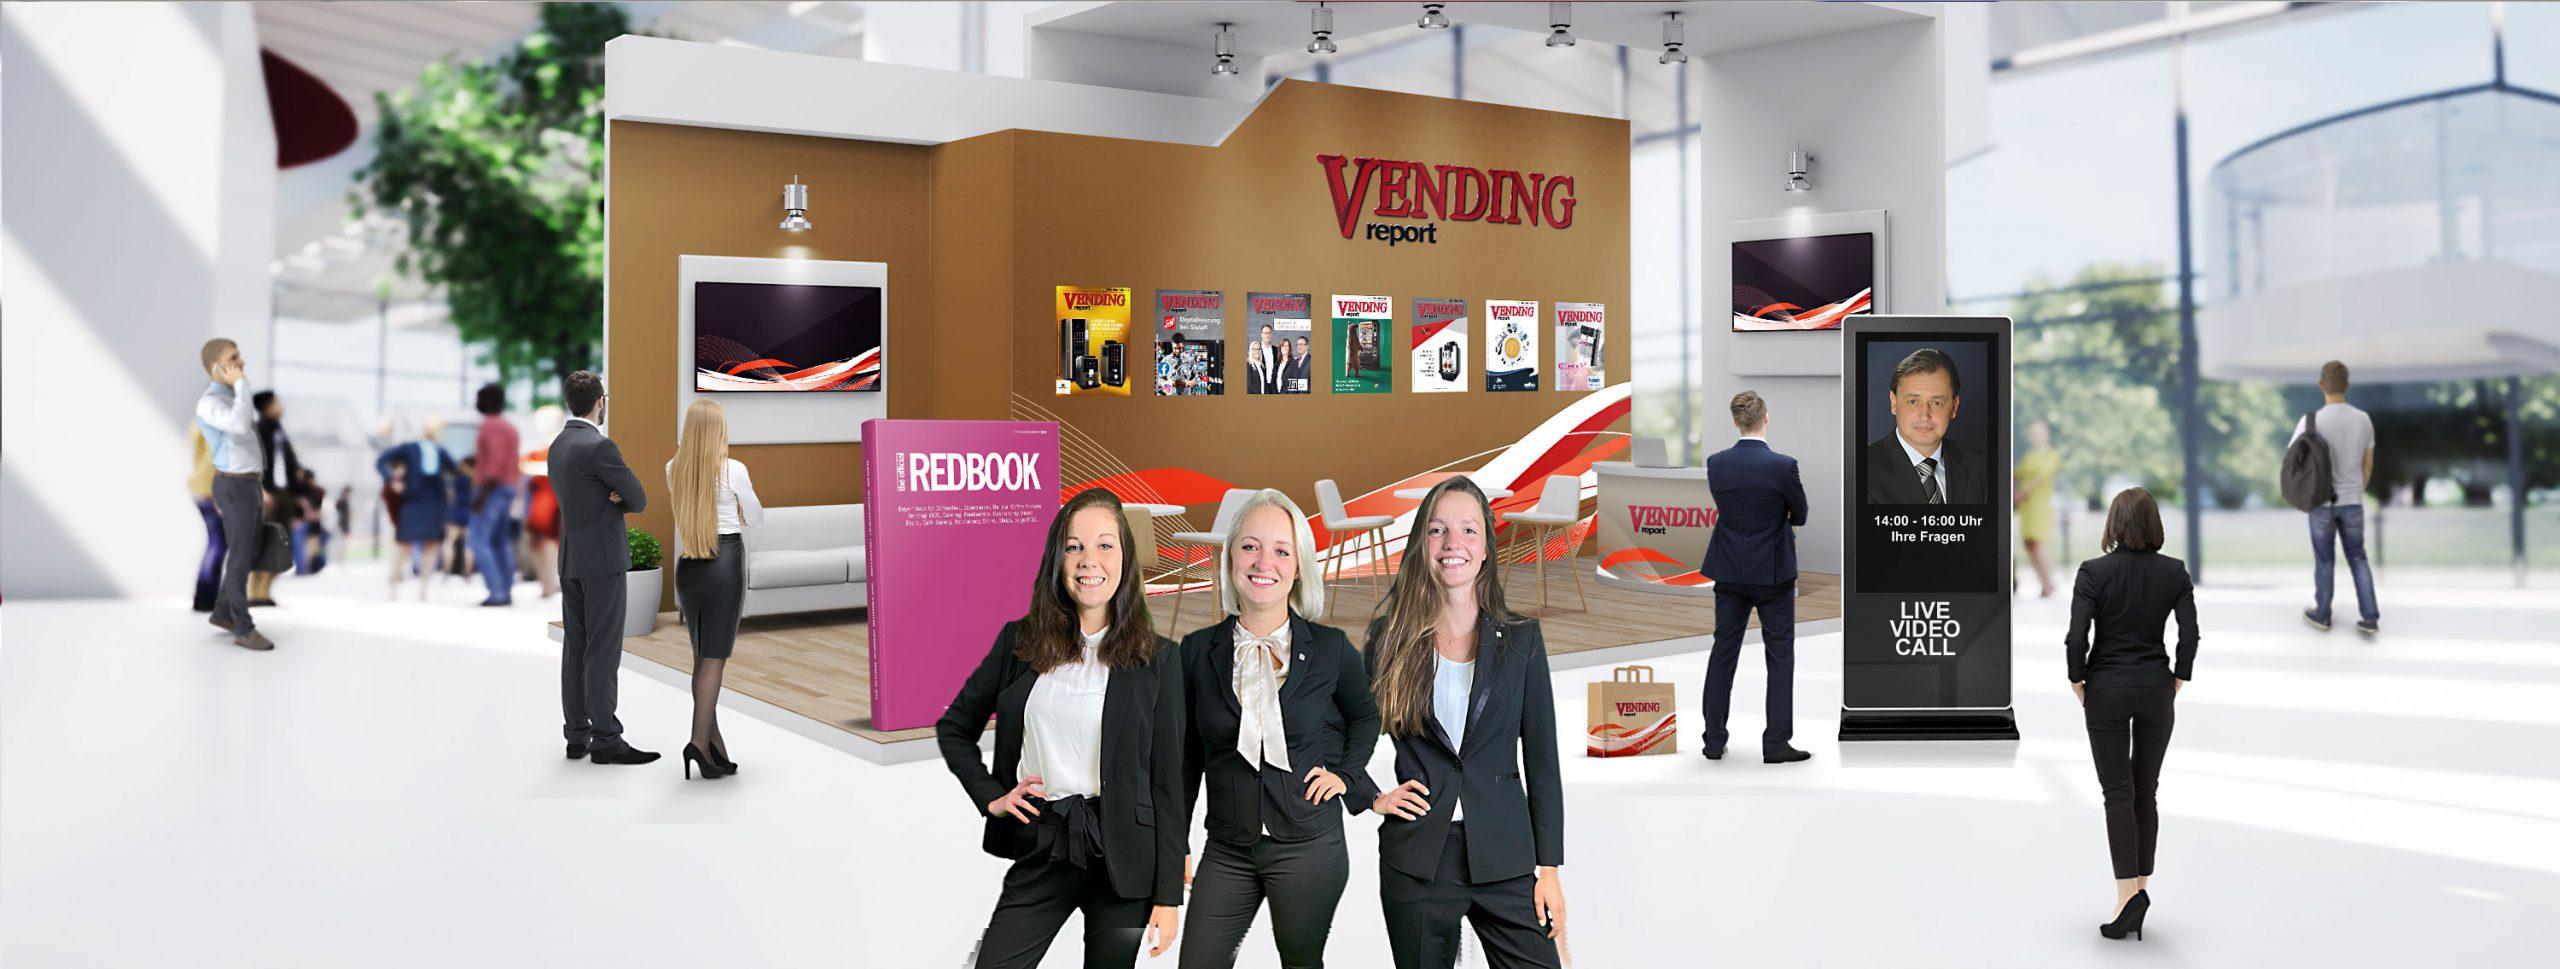 Vending Report Vendtra Vending Trade Festival Deutschland